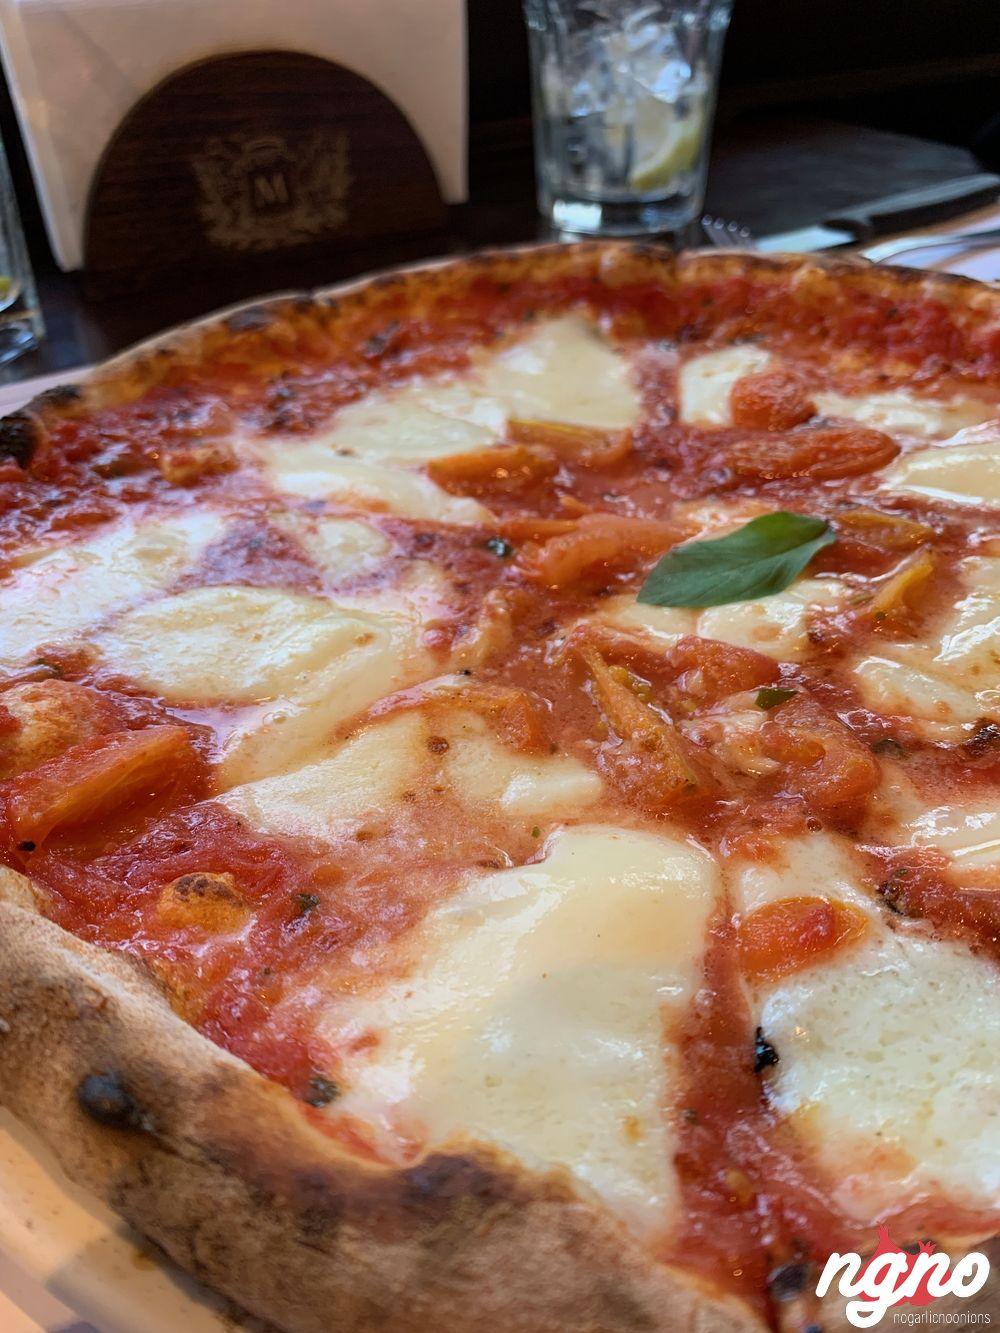 margherita-pizza-lebanon-nogarlicnoonions-132019-01-20-06-03-33